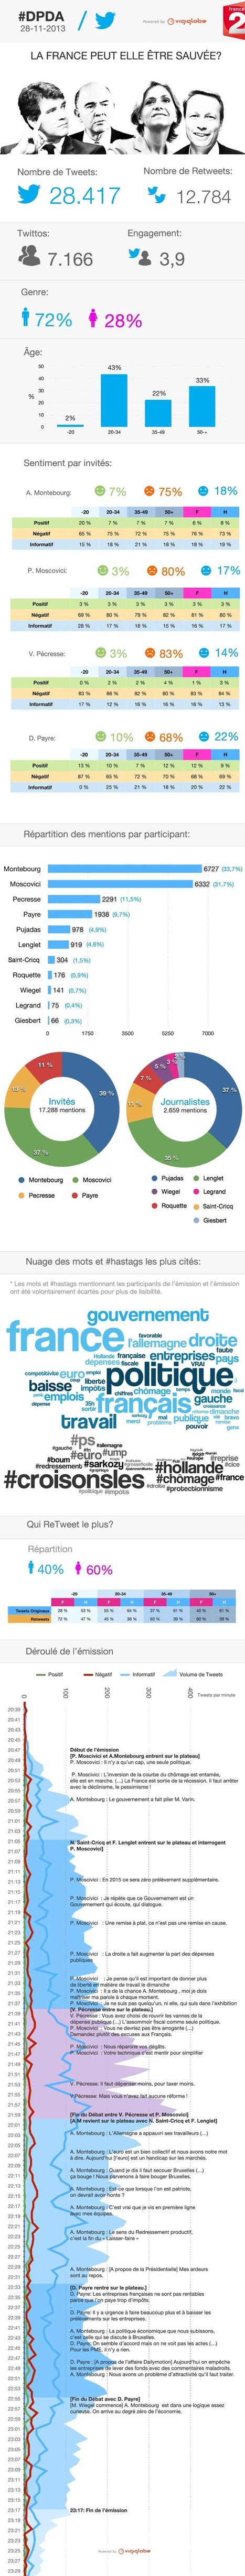 [Infographie] L'analyse des réactions sur @Twitter pendant #DPDA by @vigiglobe | TV connected | Scoop.it